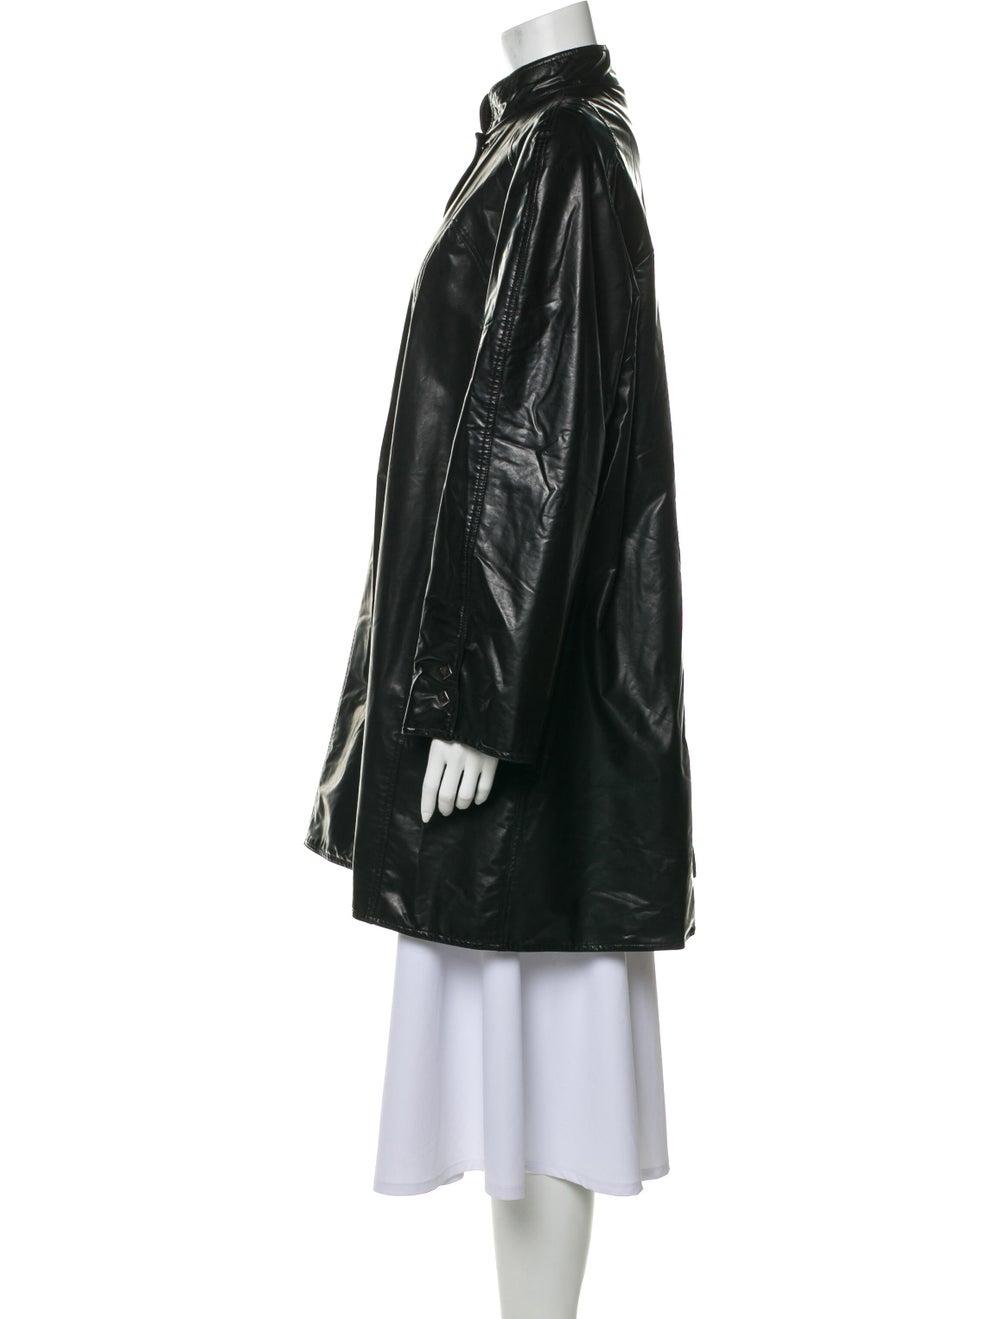 Thierry Mugler Evening Jacket Black - image 2